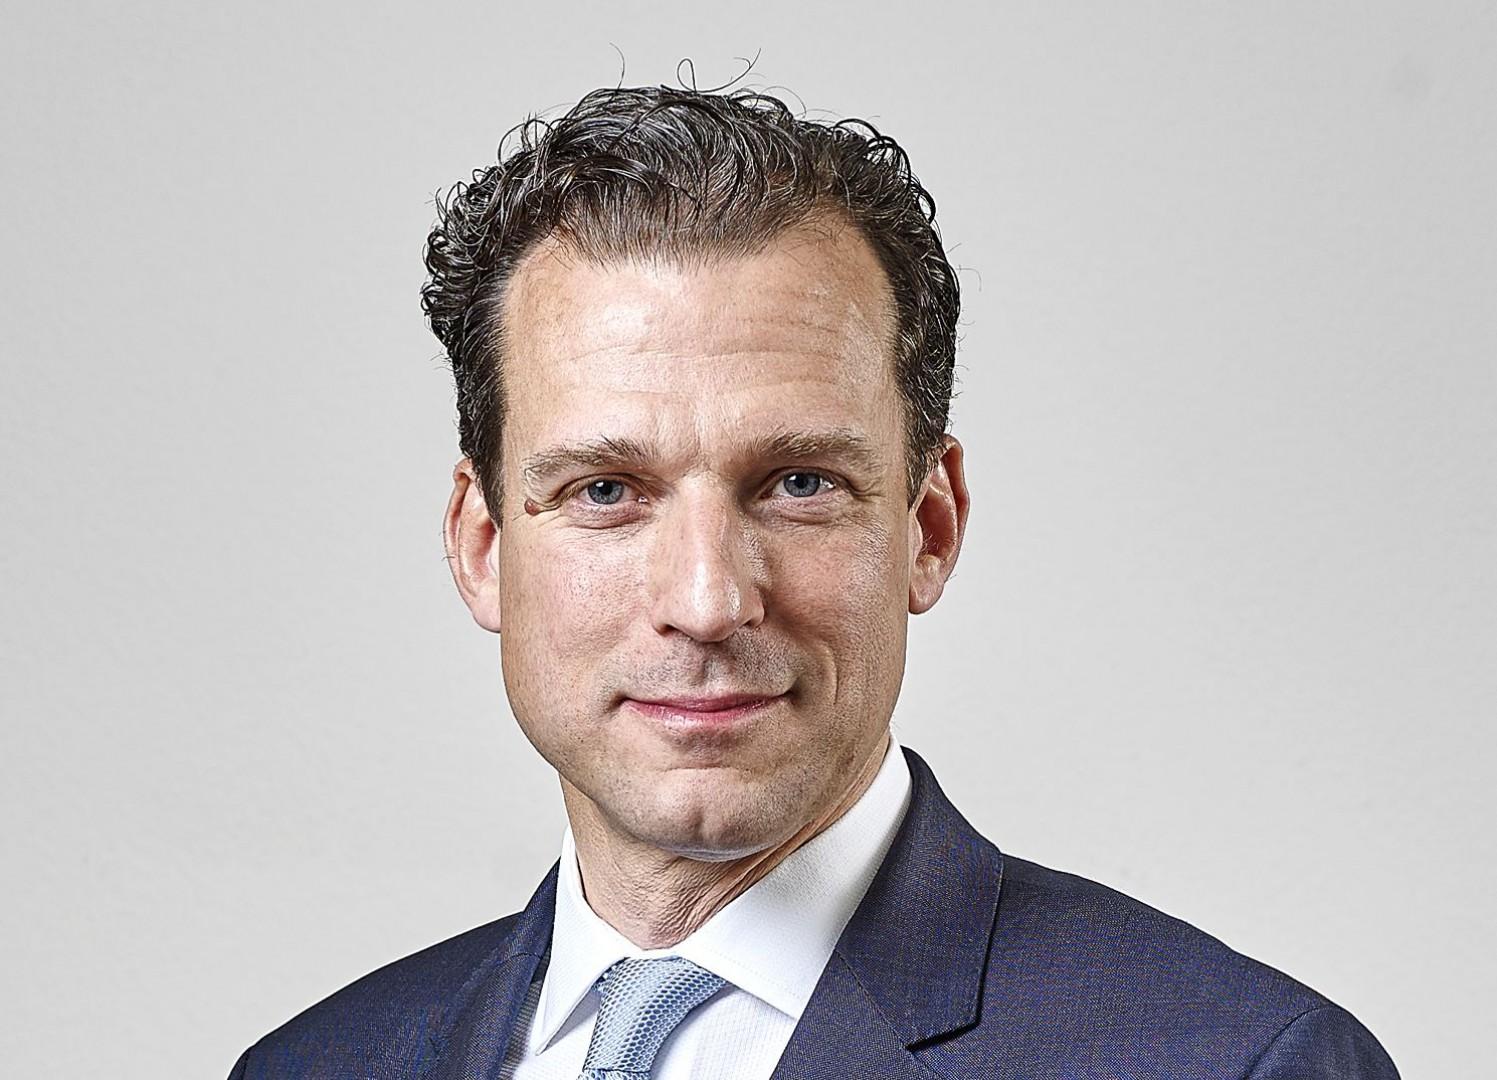 Martin Brettenthaler